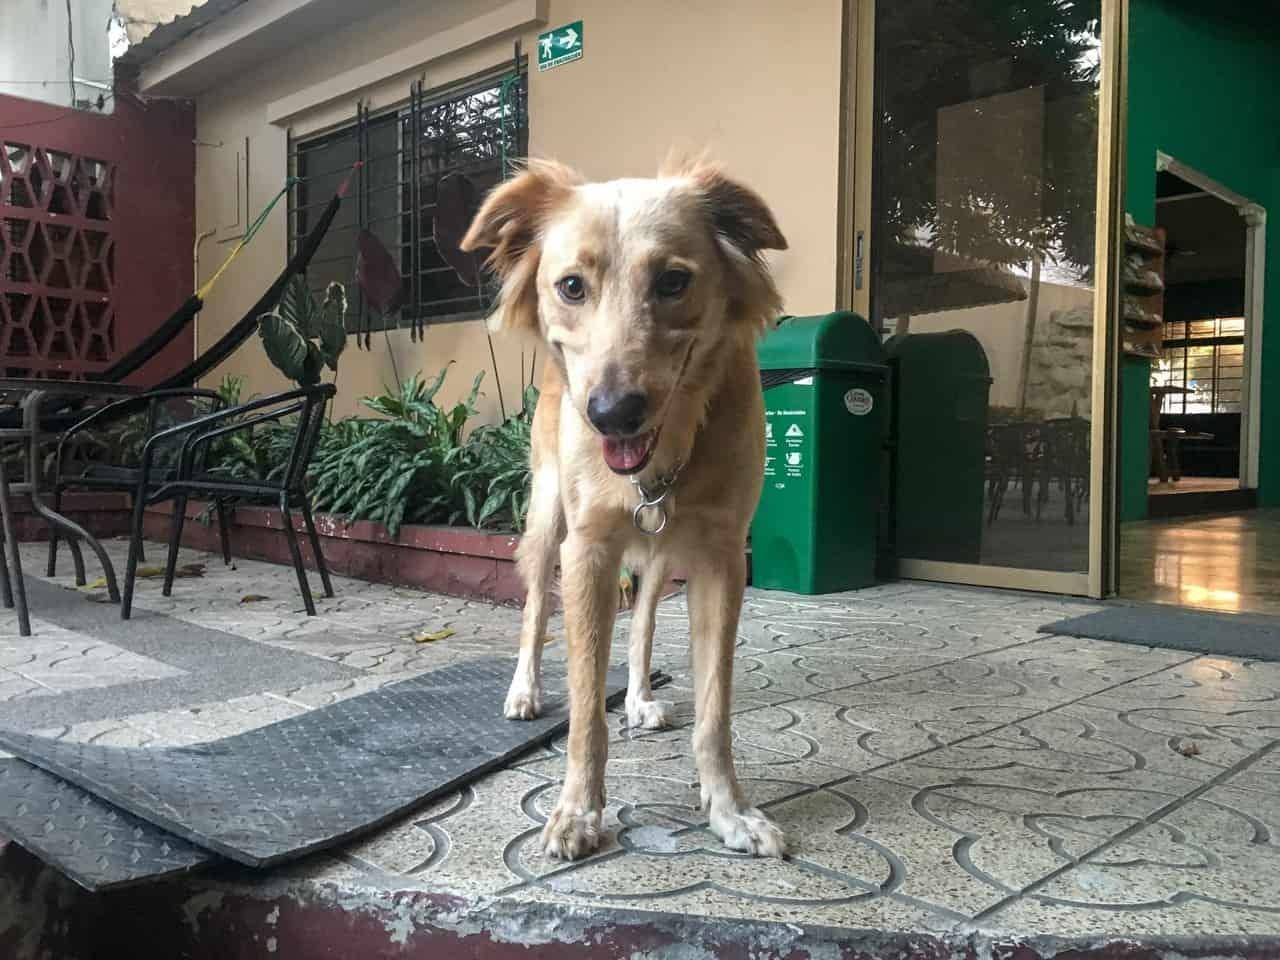 Nacho, the friendly dog at Hostel Nucapacha, Guayaquil, Ecuador